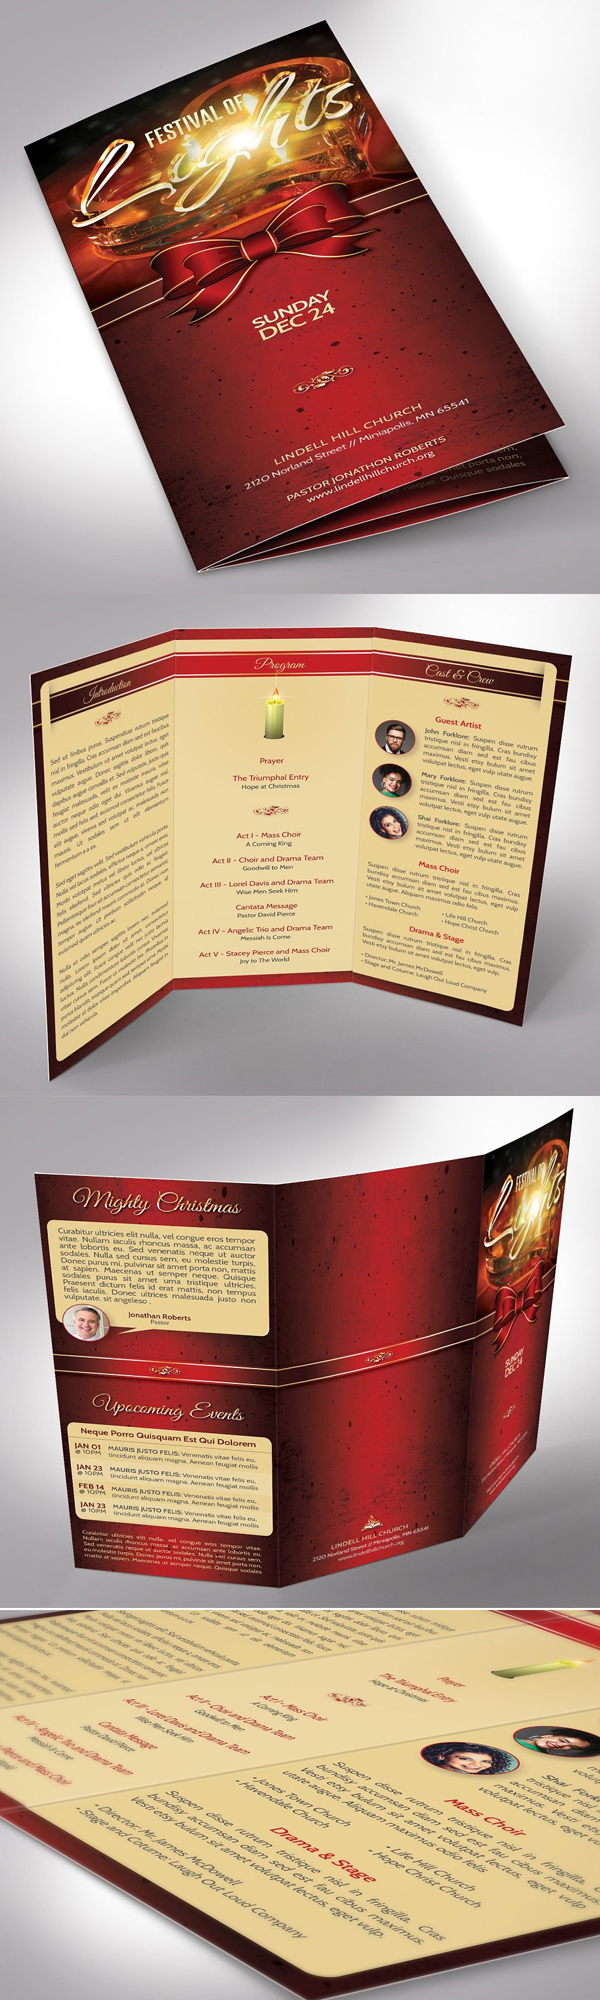 Candle Light Tri-fold Brochure